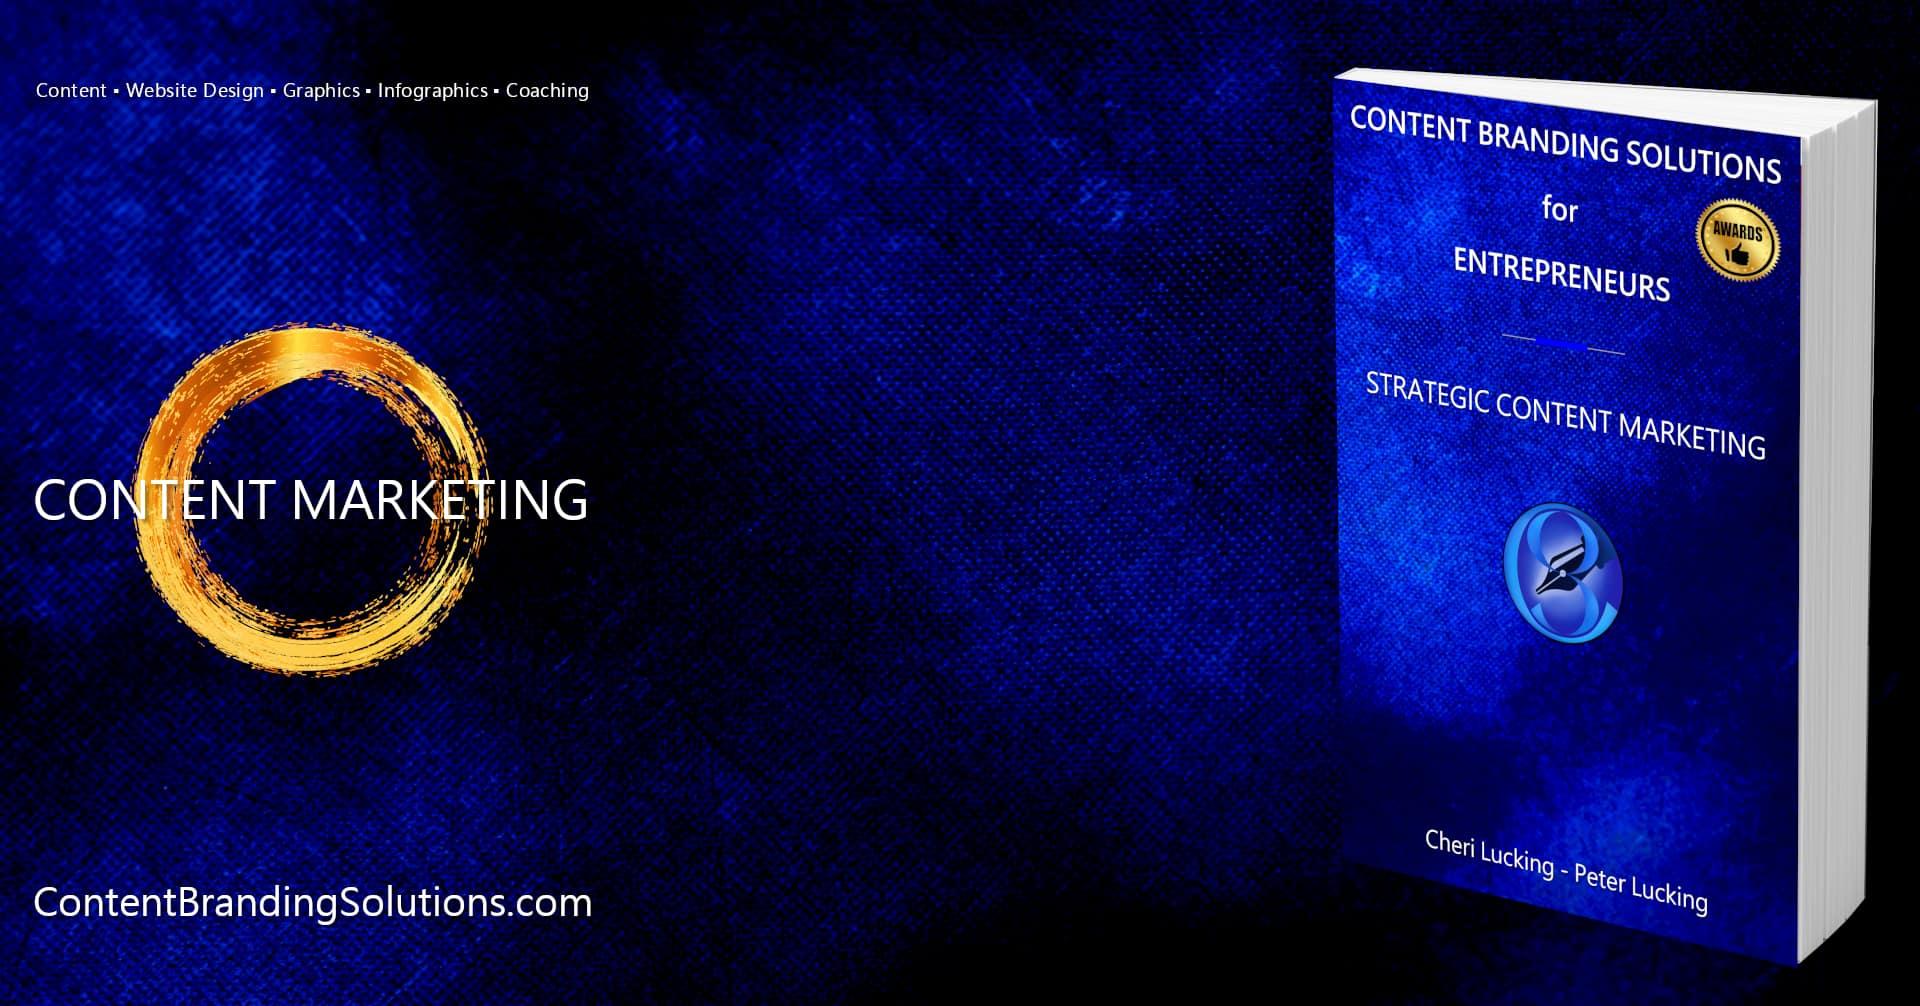 Book Content Branding Solutions for Entreprenurs